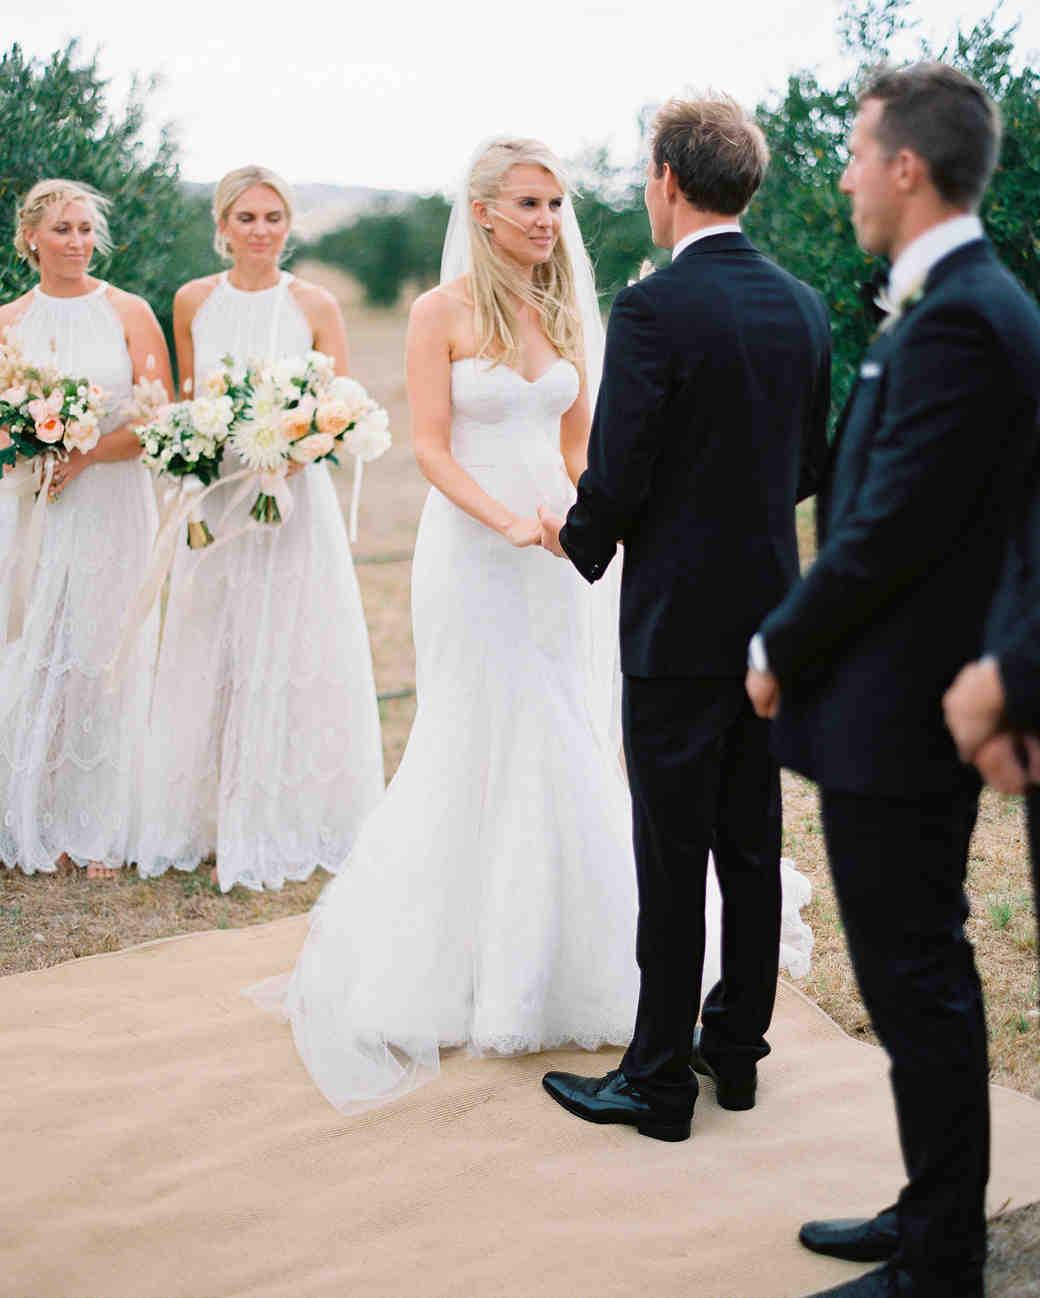 Unique Wedding Vows For Him: Unique Wedding Vows For The Modern Couple